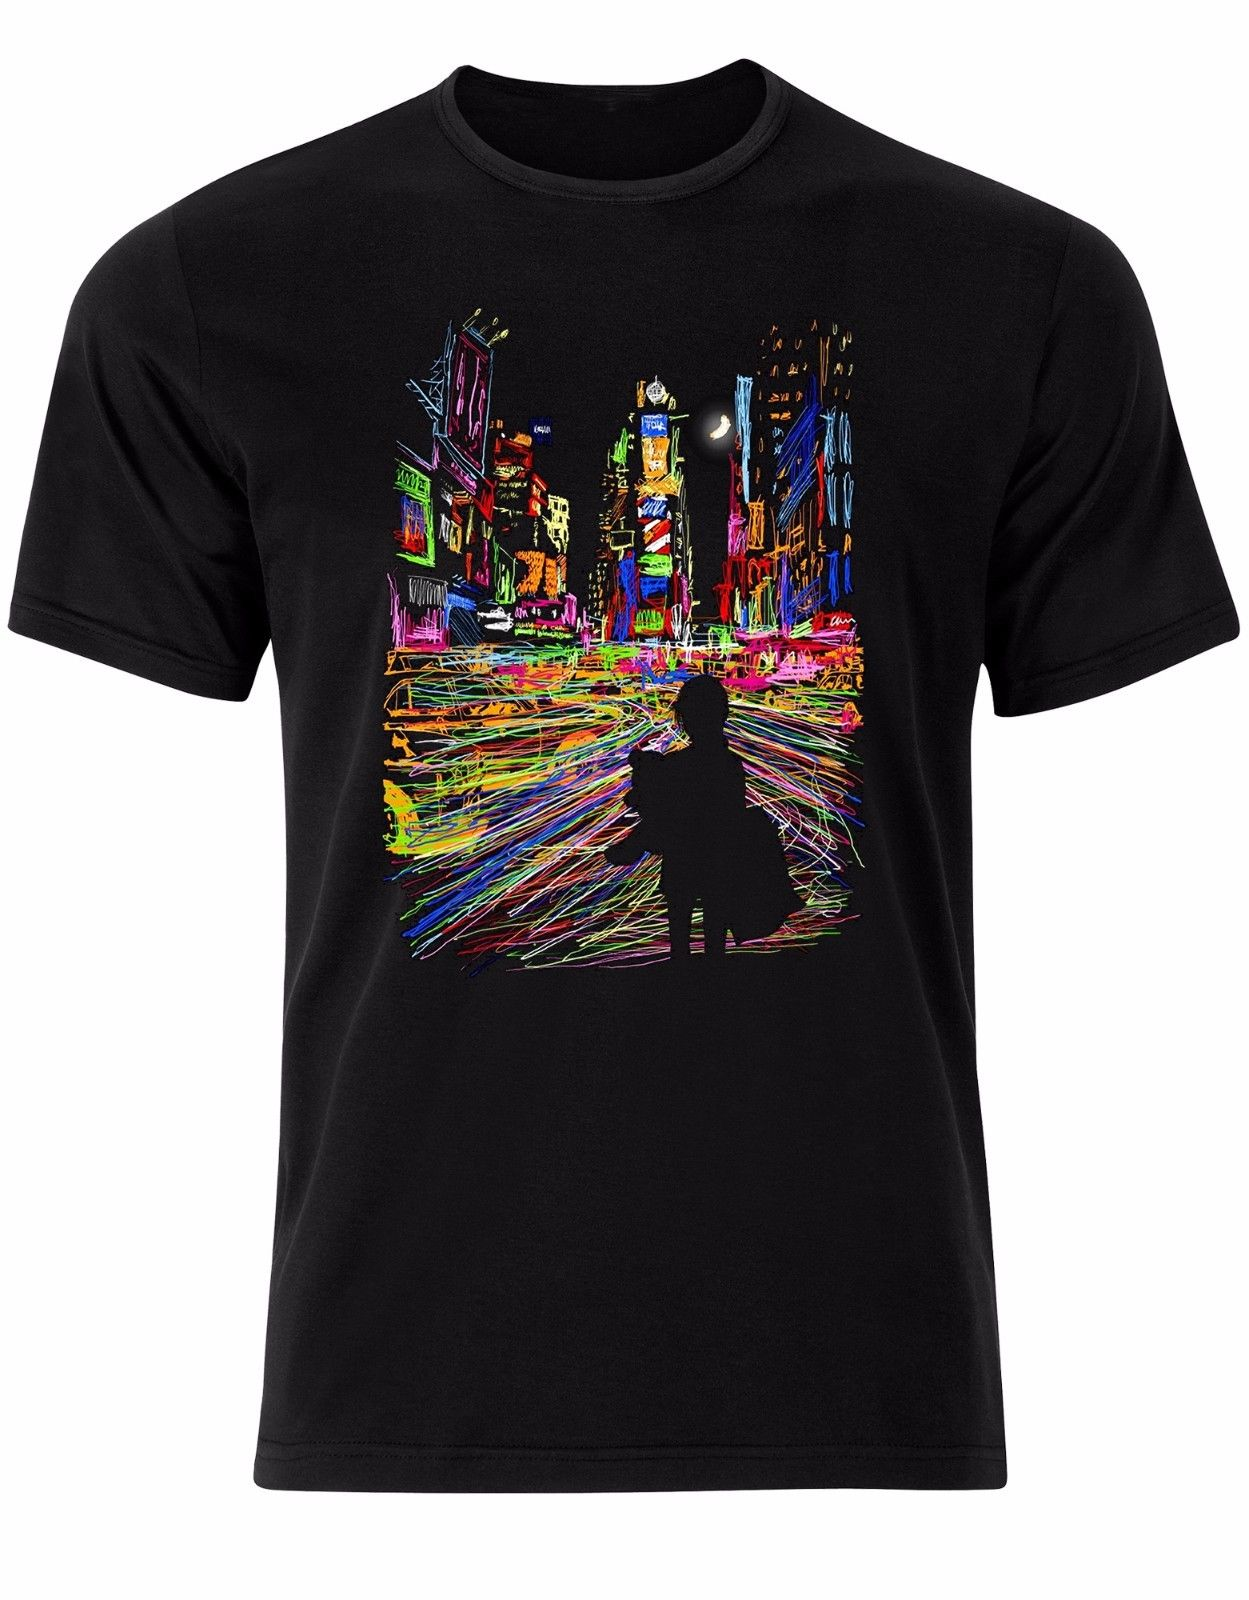 City Lights Moon Night Neon Colours Dreams Pillow Mens Tshirt Tee Top AL65